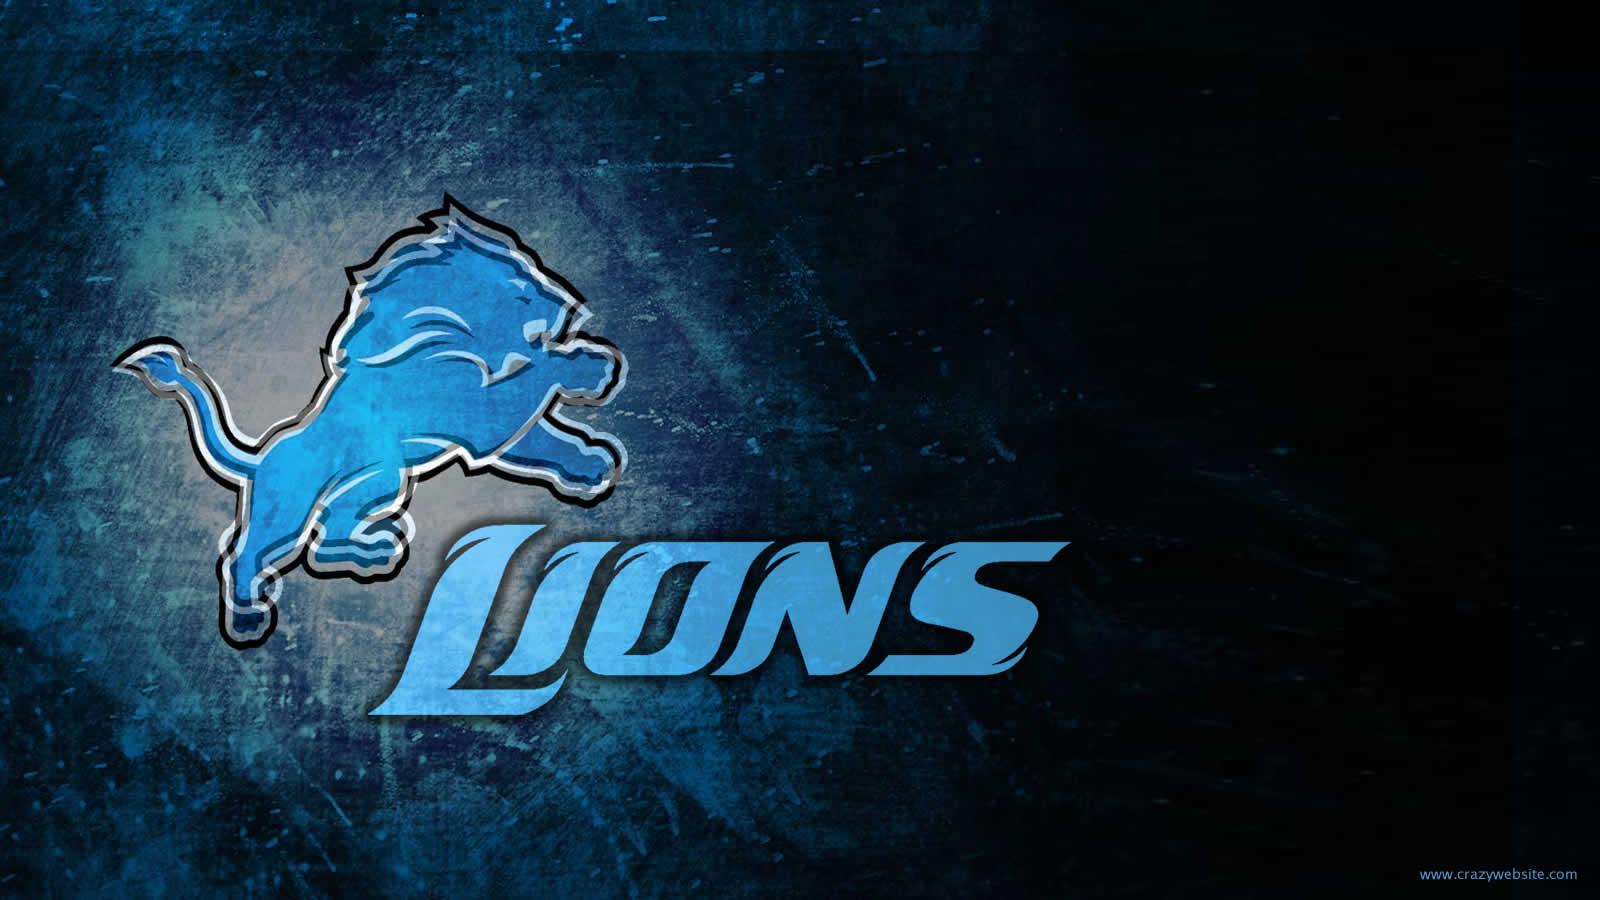 Detroit Lions Team Logo Wallpaper 1600x900 1600x900